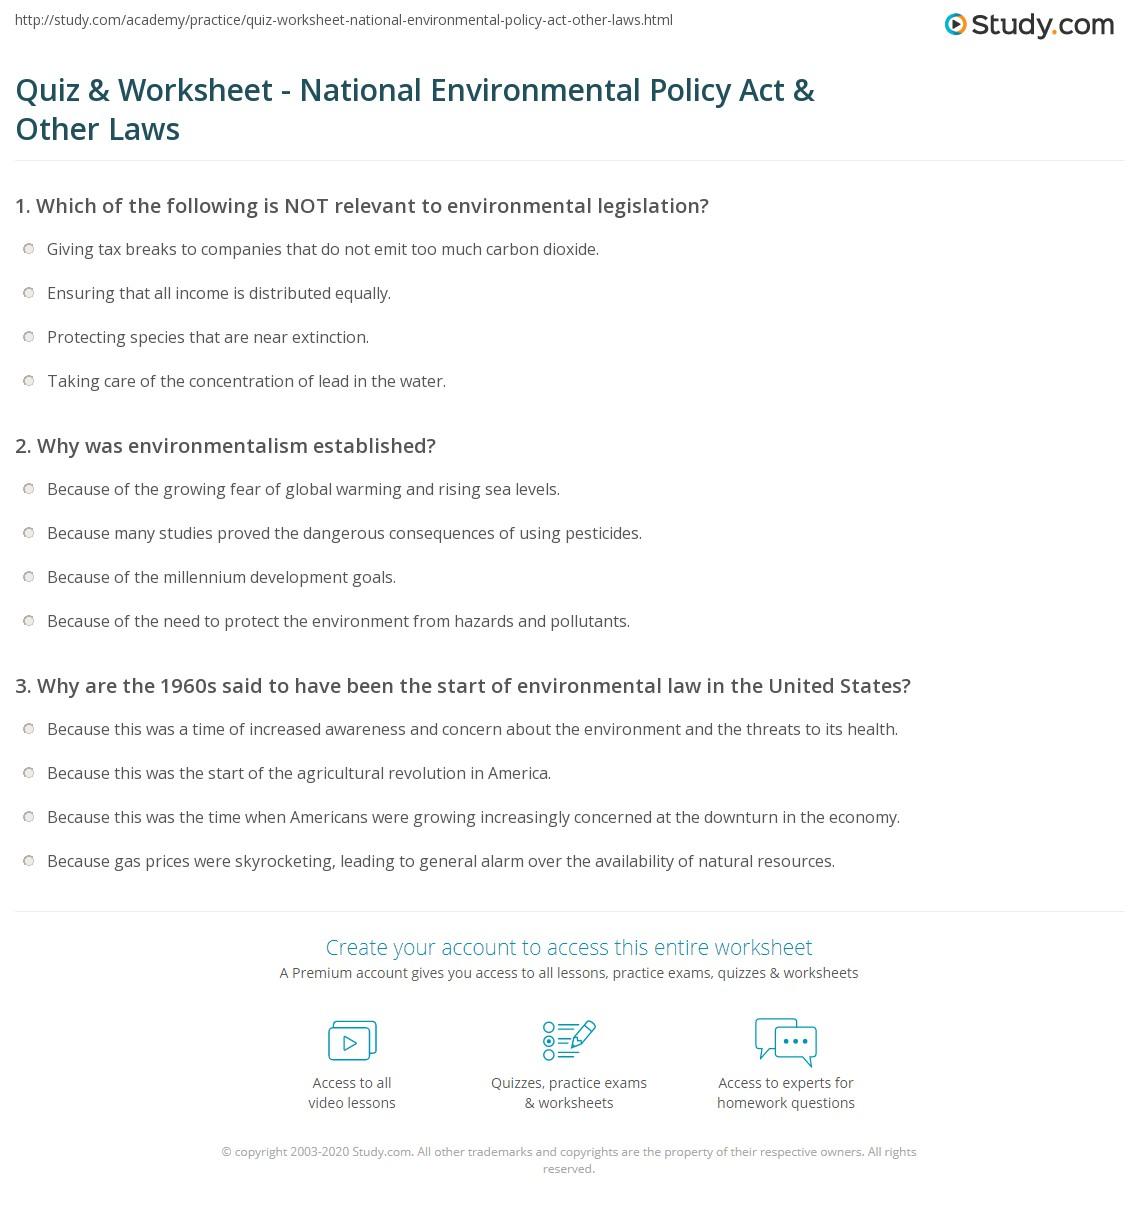 Worksheets Act Values Worksheet quiz worksheet national environmental policy act other laws print what is legislation regulations timeline worksheet